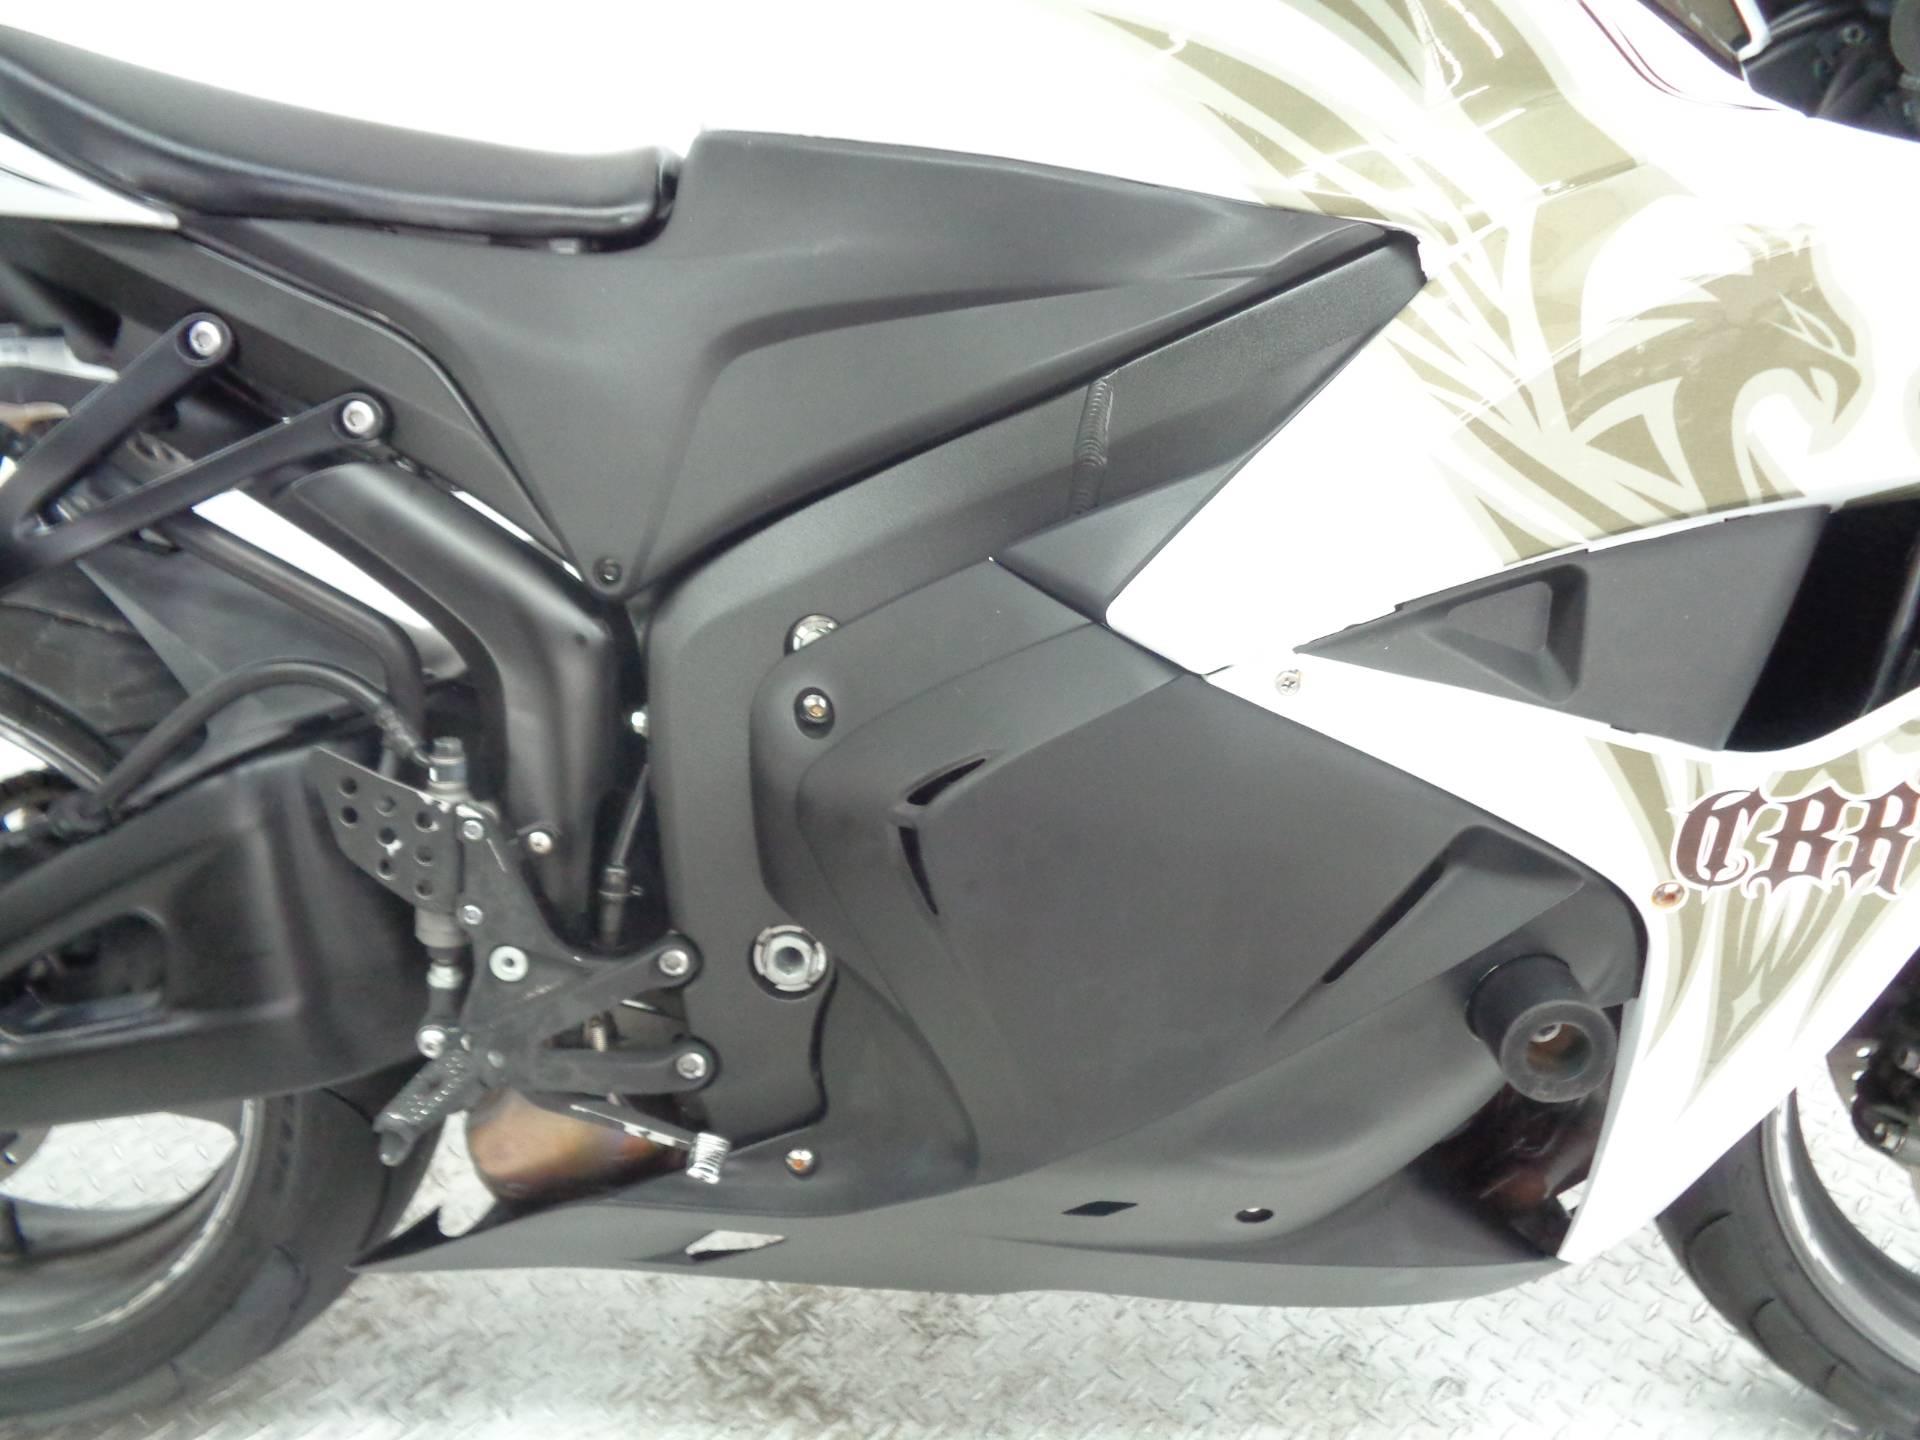 Used 2009 Honda CBR®600RR Motorcycles in Tulsa, OK | Stock Number: 200226